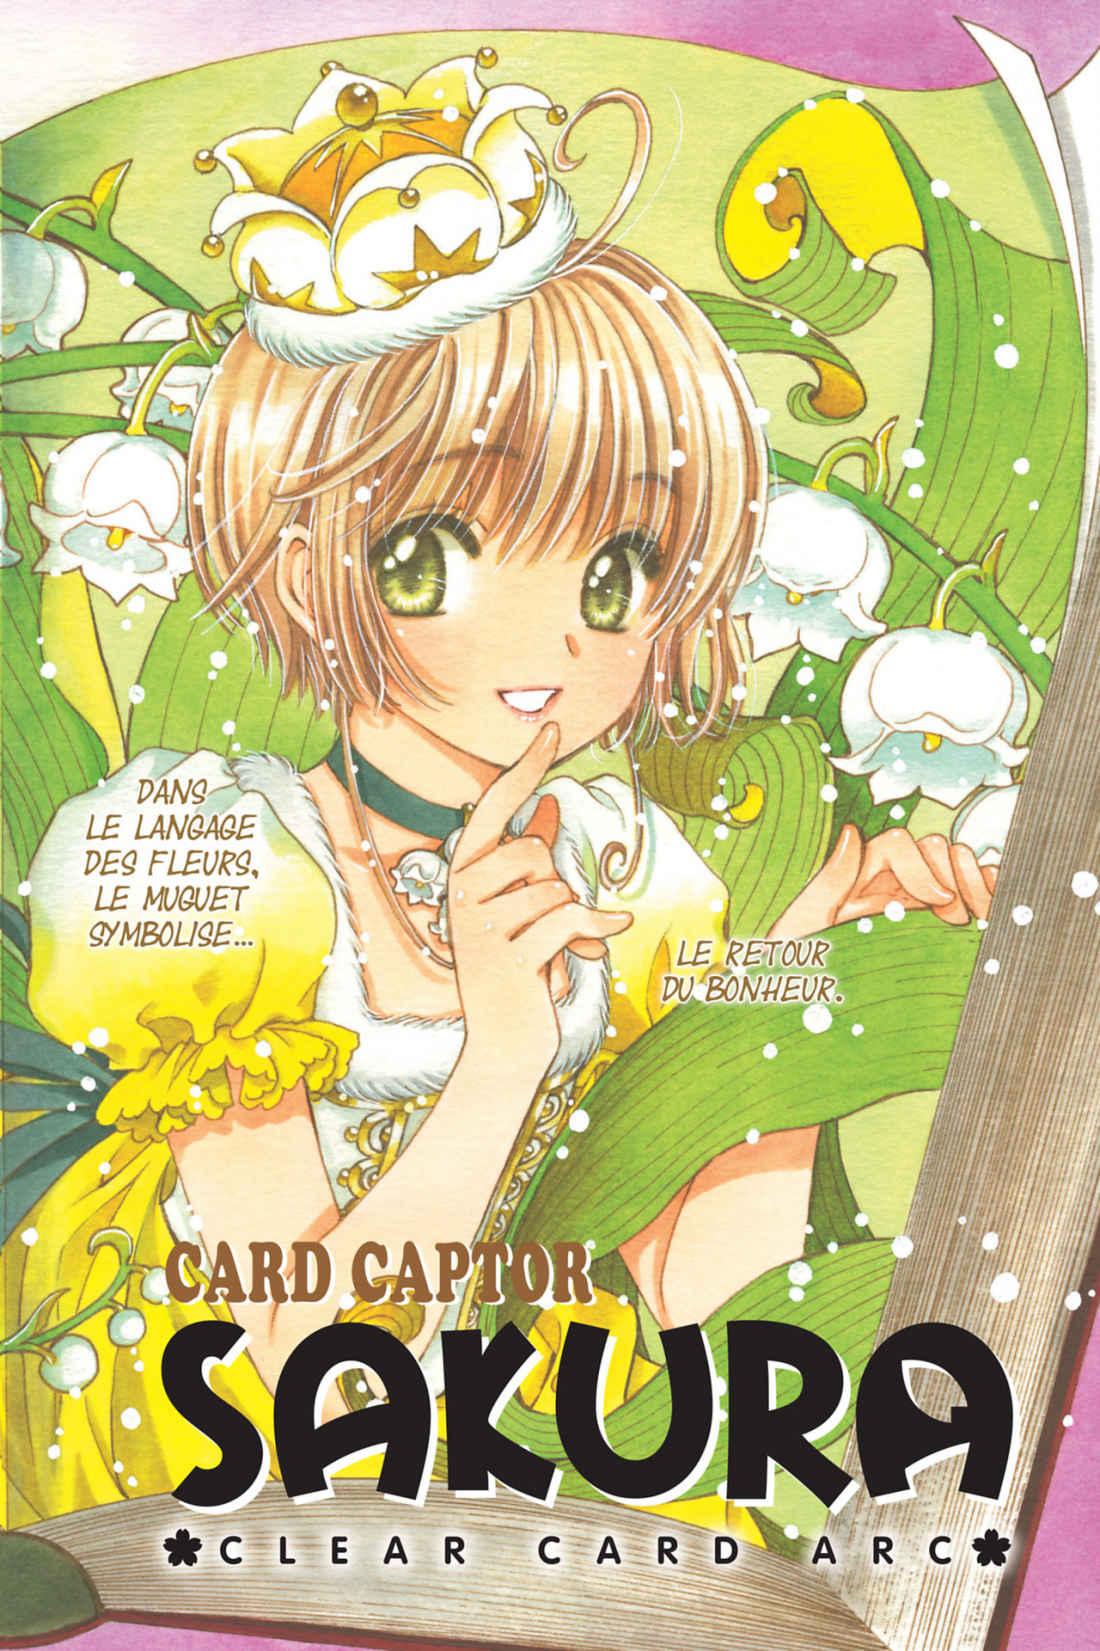 Card Captor Sakura et autres mangas [CLAMP] - Page 39 Cardca15